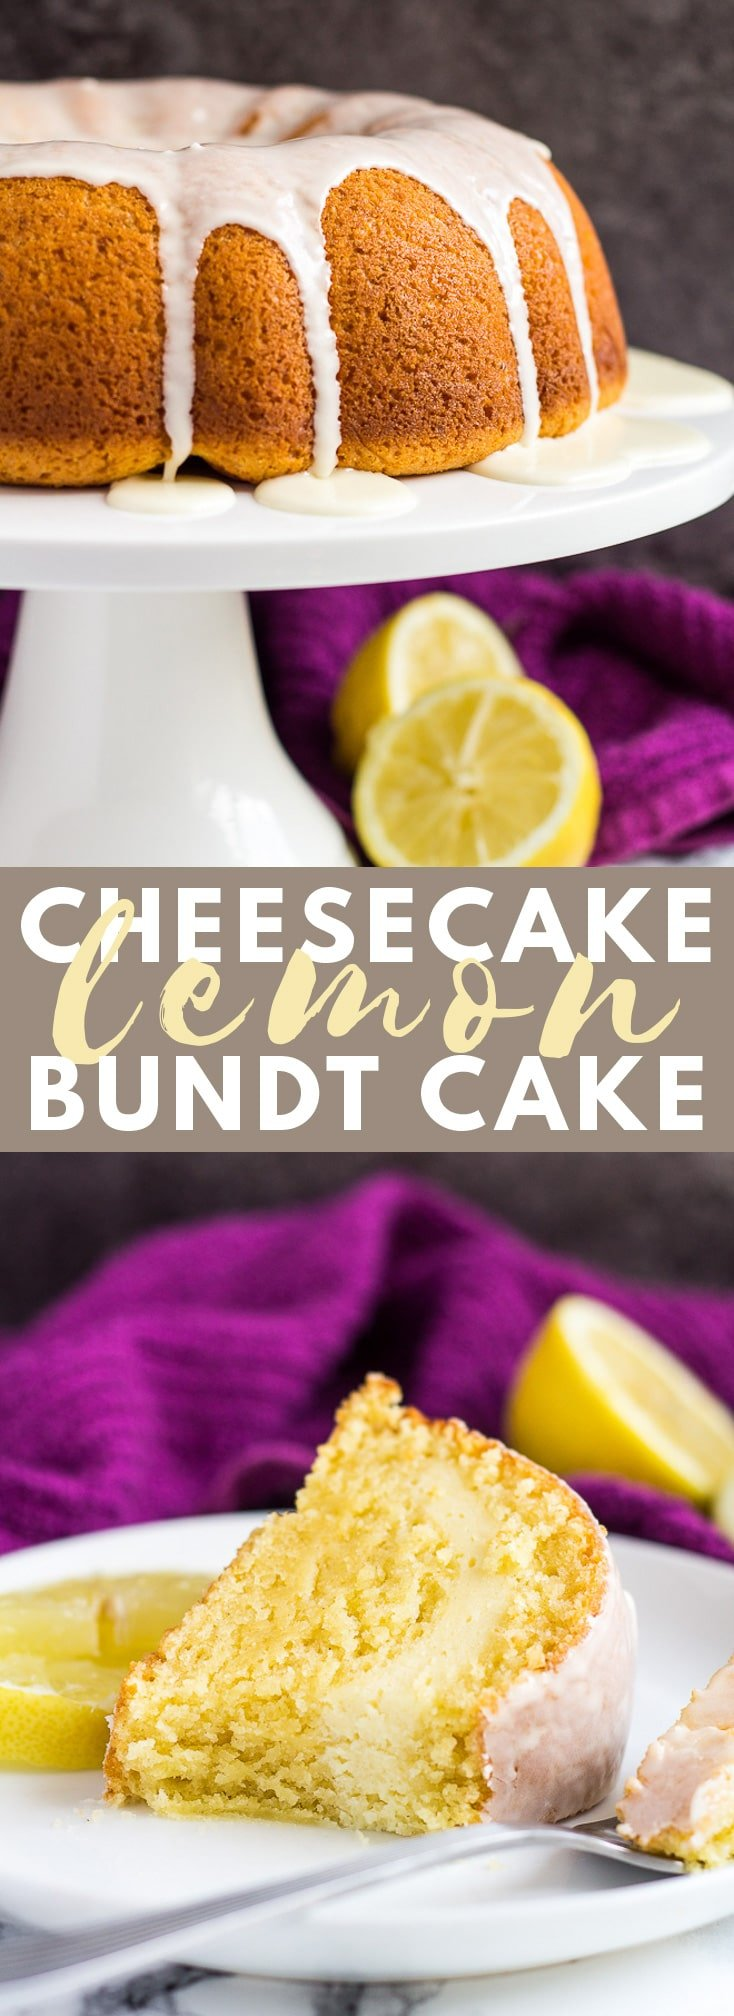 Cheesecake Swirl Lemon Bundt Cake- Deliciously moist and fluffy lemon-infused bundt cake, filled with a cheesecake swirl, and drizzled with a lemon glaze! #cheesecake #lemon #bundtcake #cakerecipes